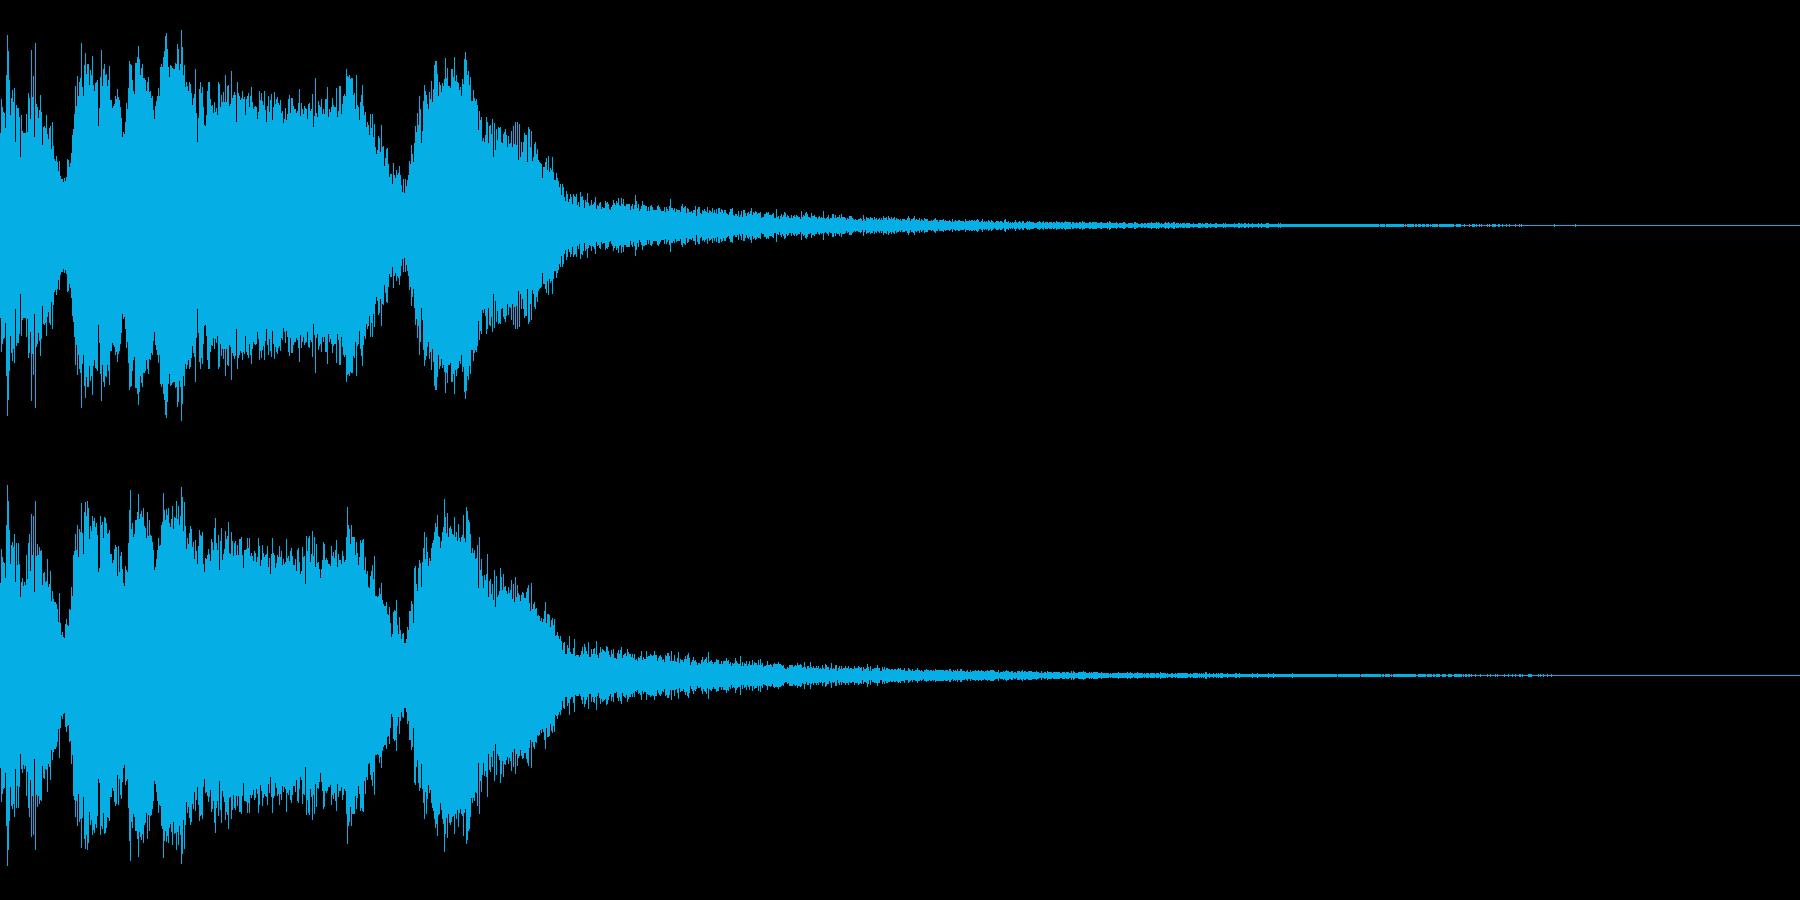 DJFX ヒットチャート発表前SE 15の再生済みの波形